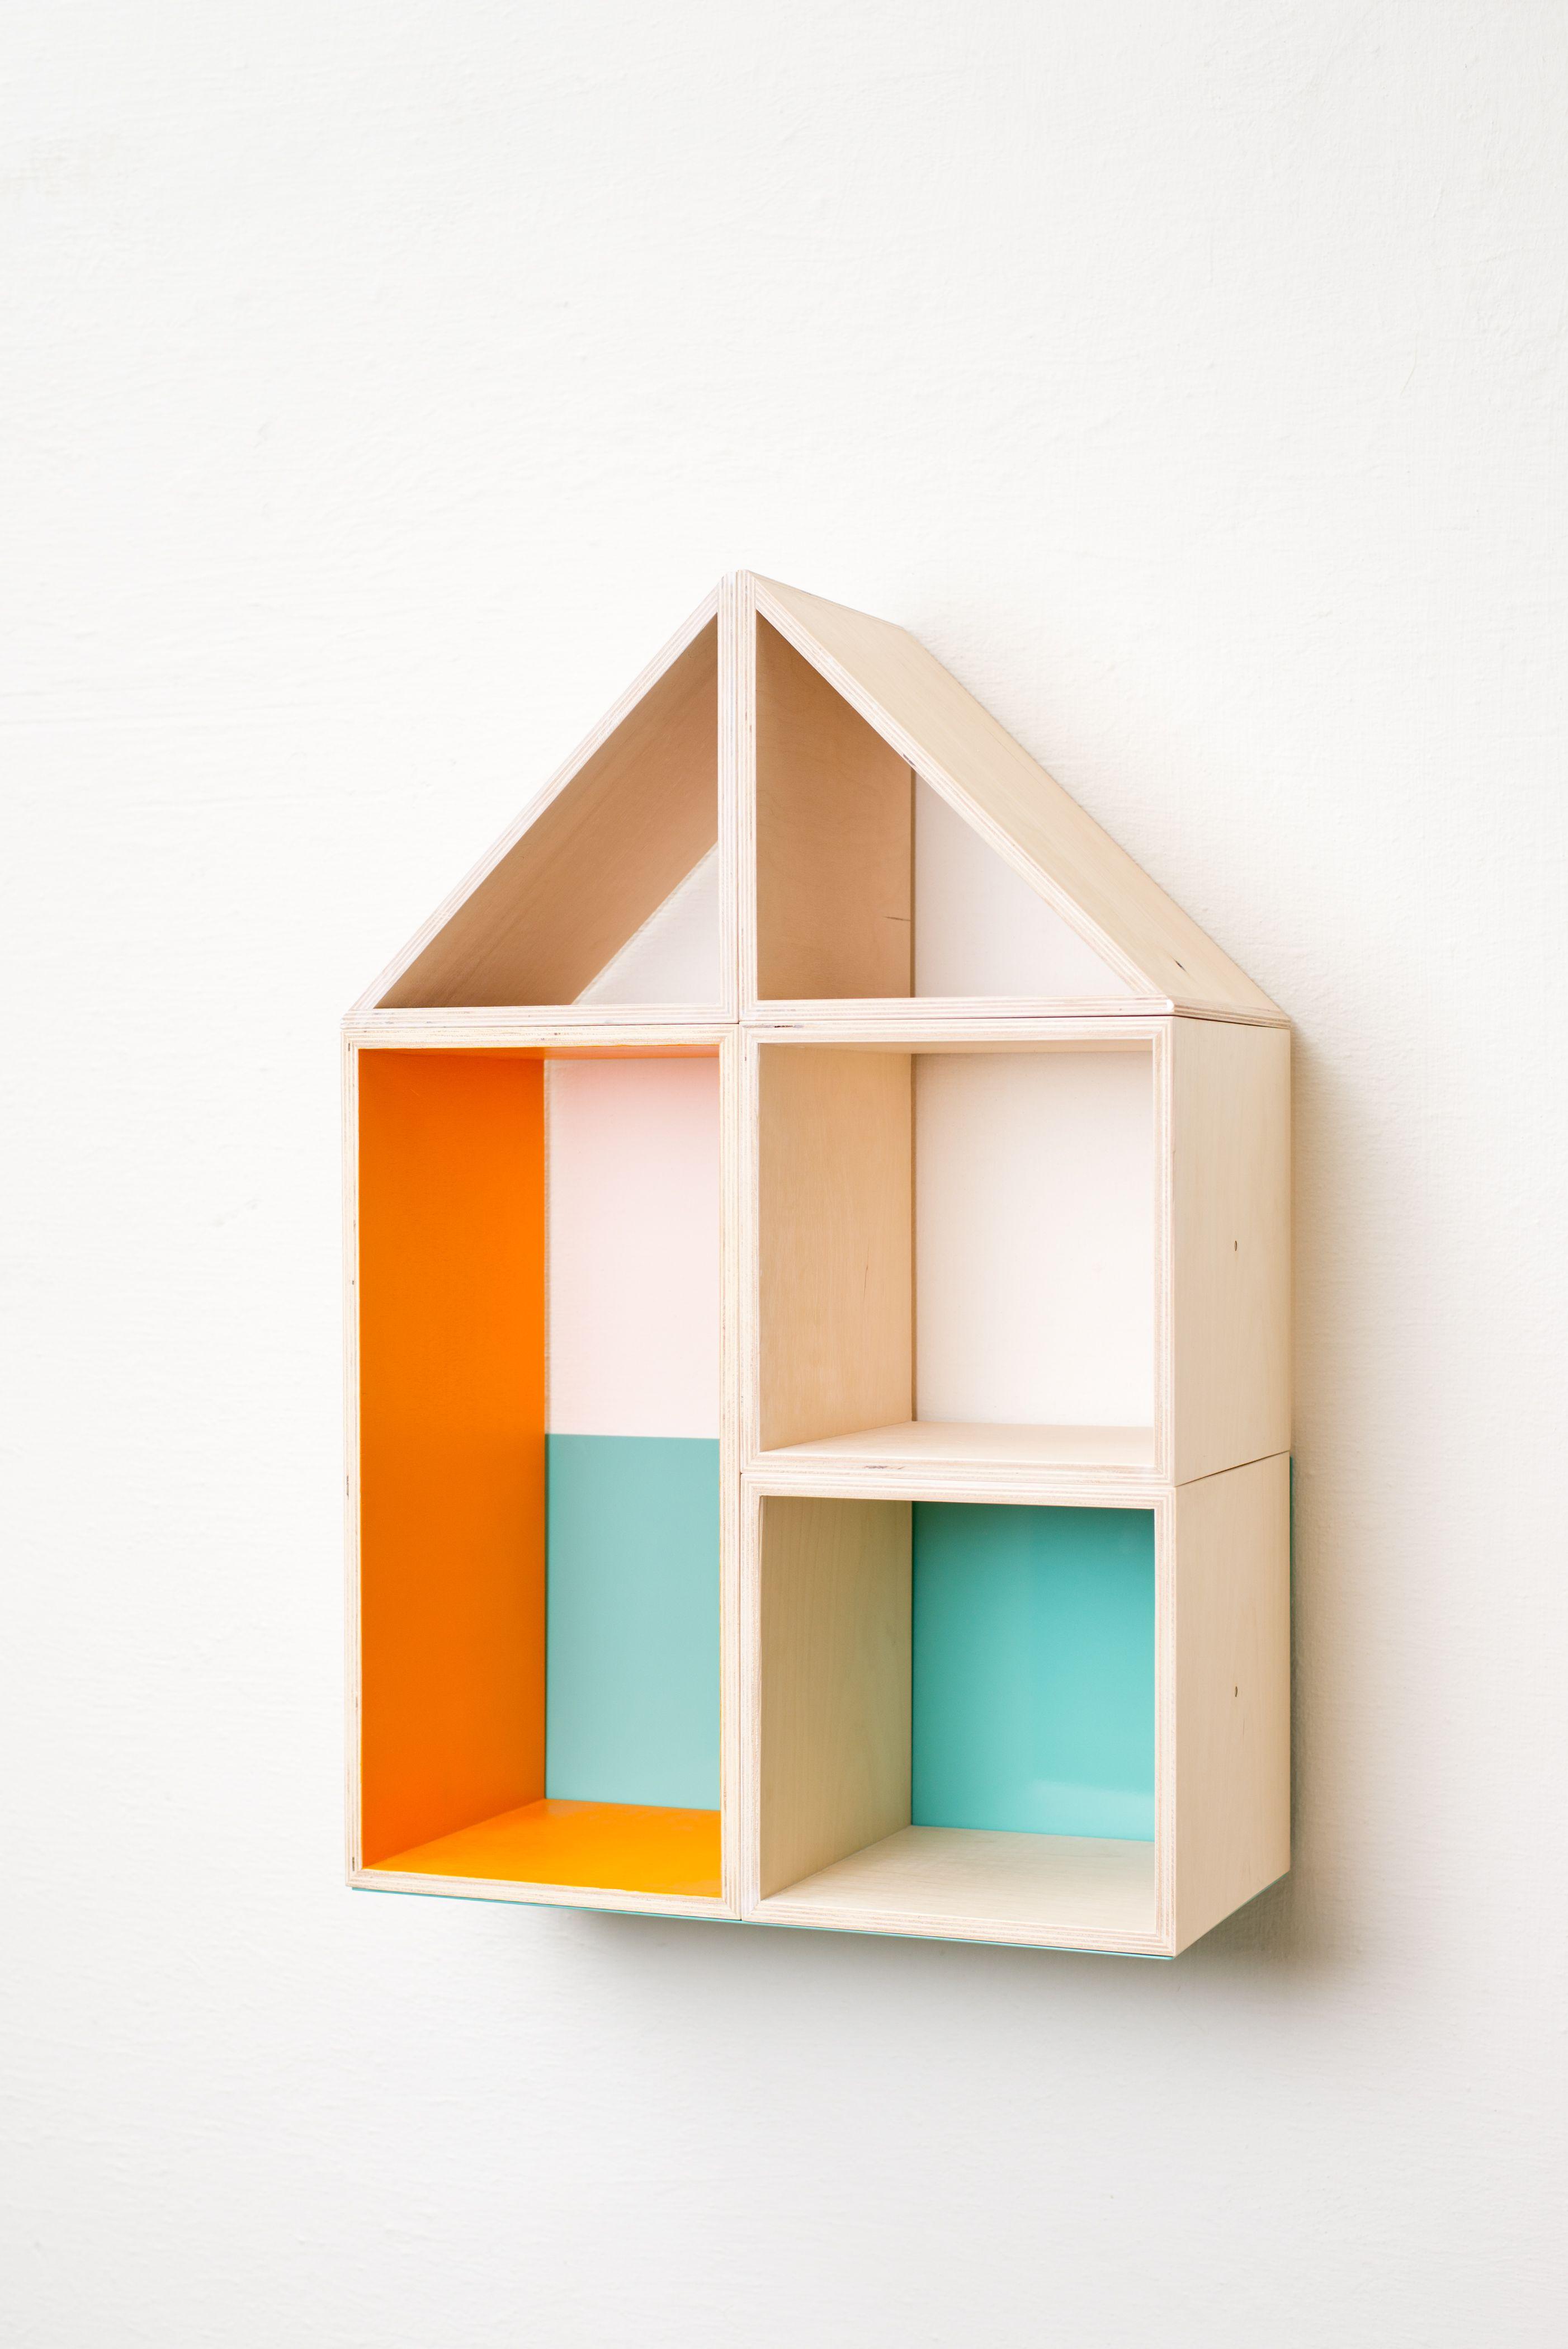 aroomy - variations 4                                        #child #present #diy #education #homedecor #interior #shelf #dollhouse